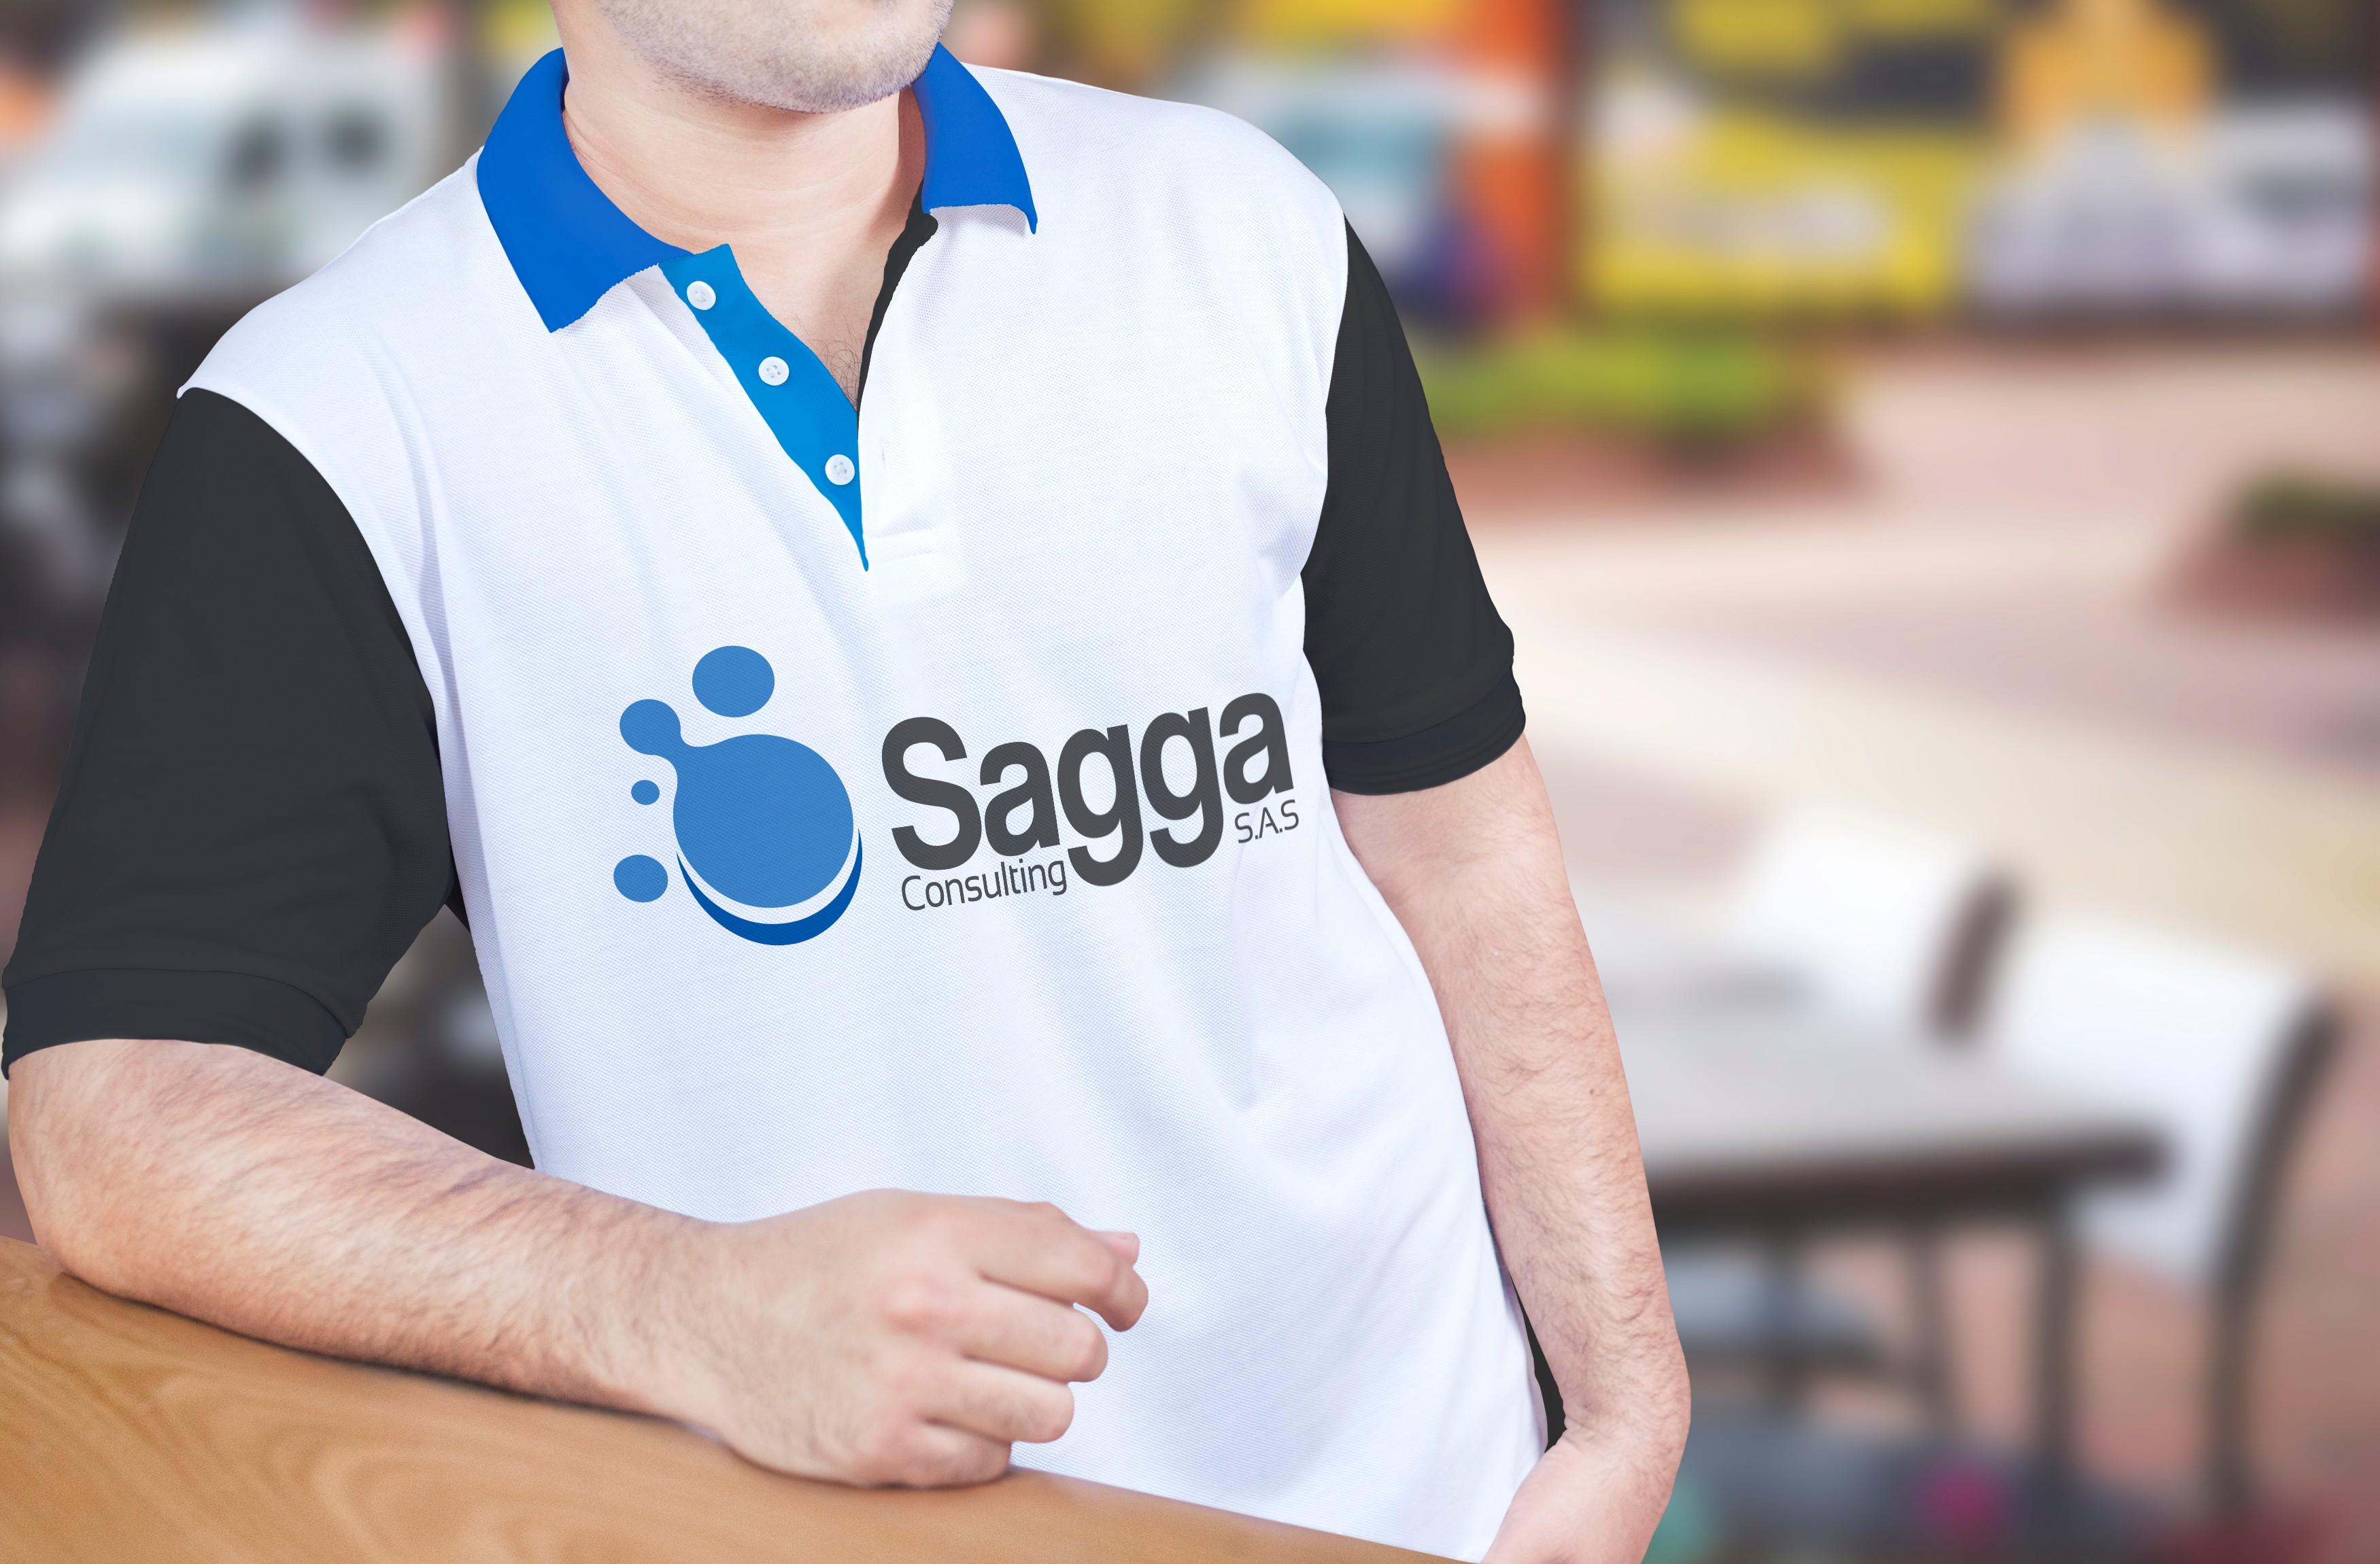 SAGGA CONSULTING